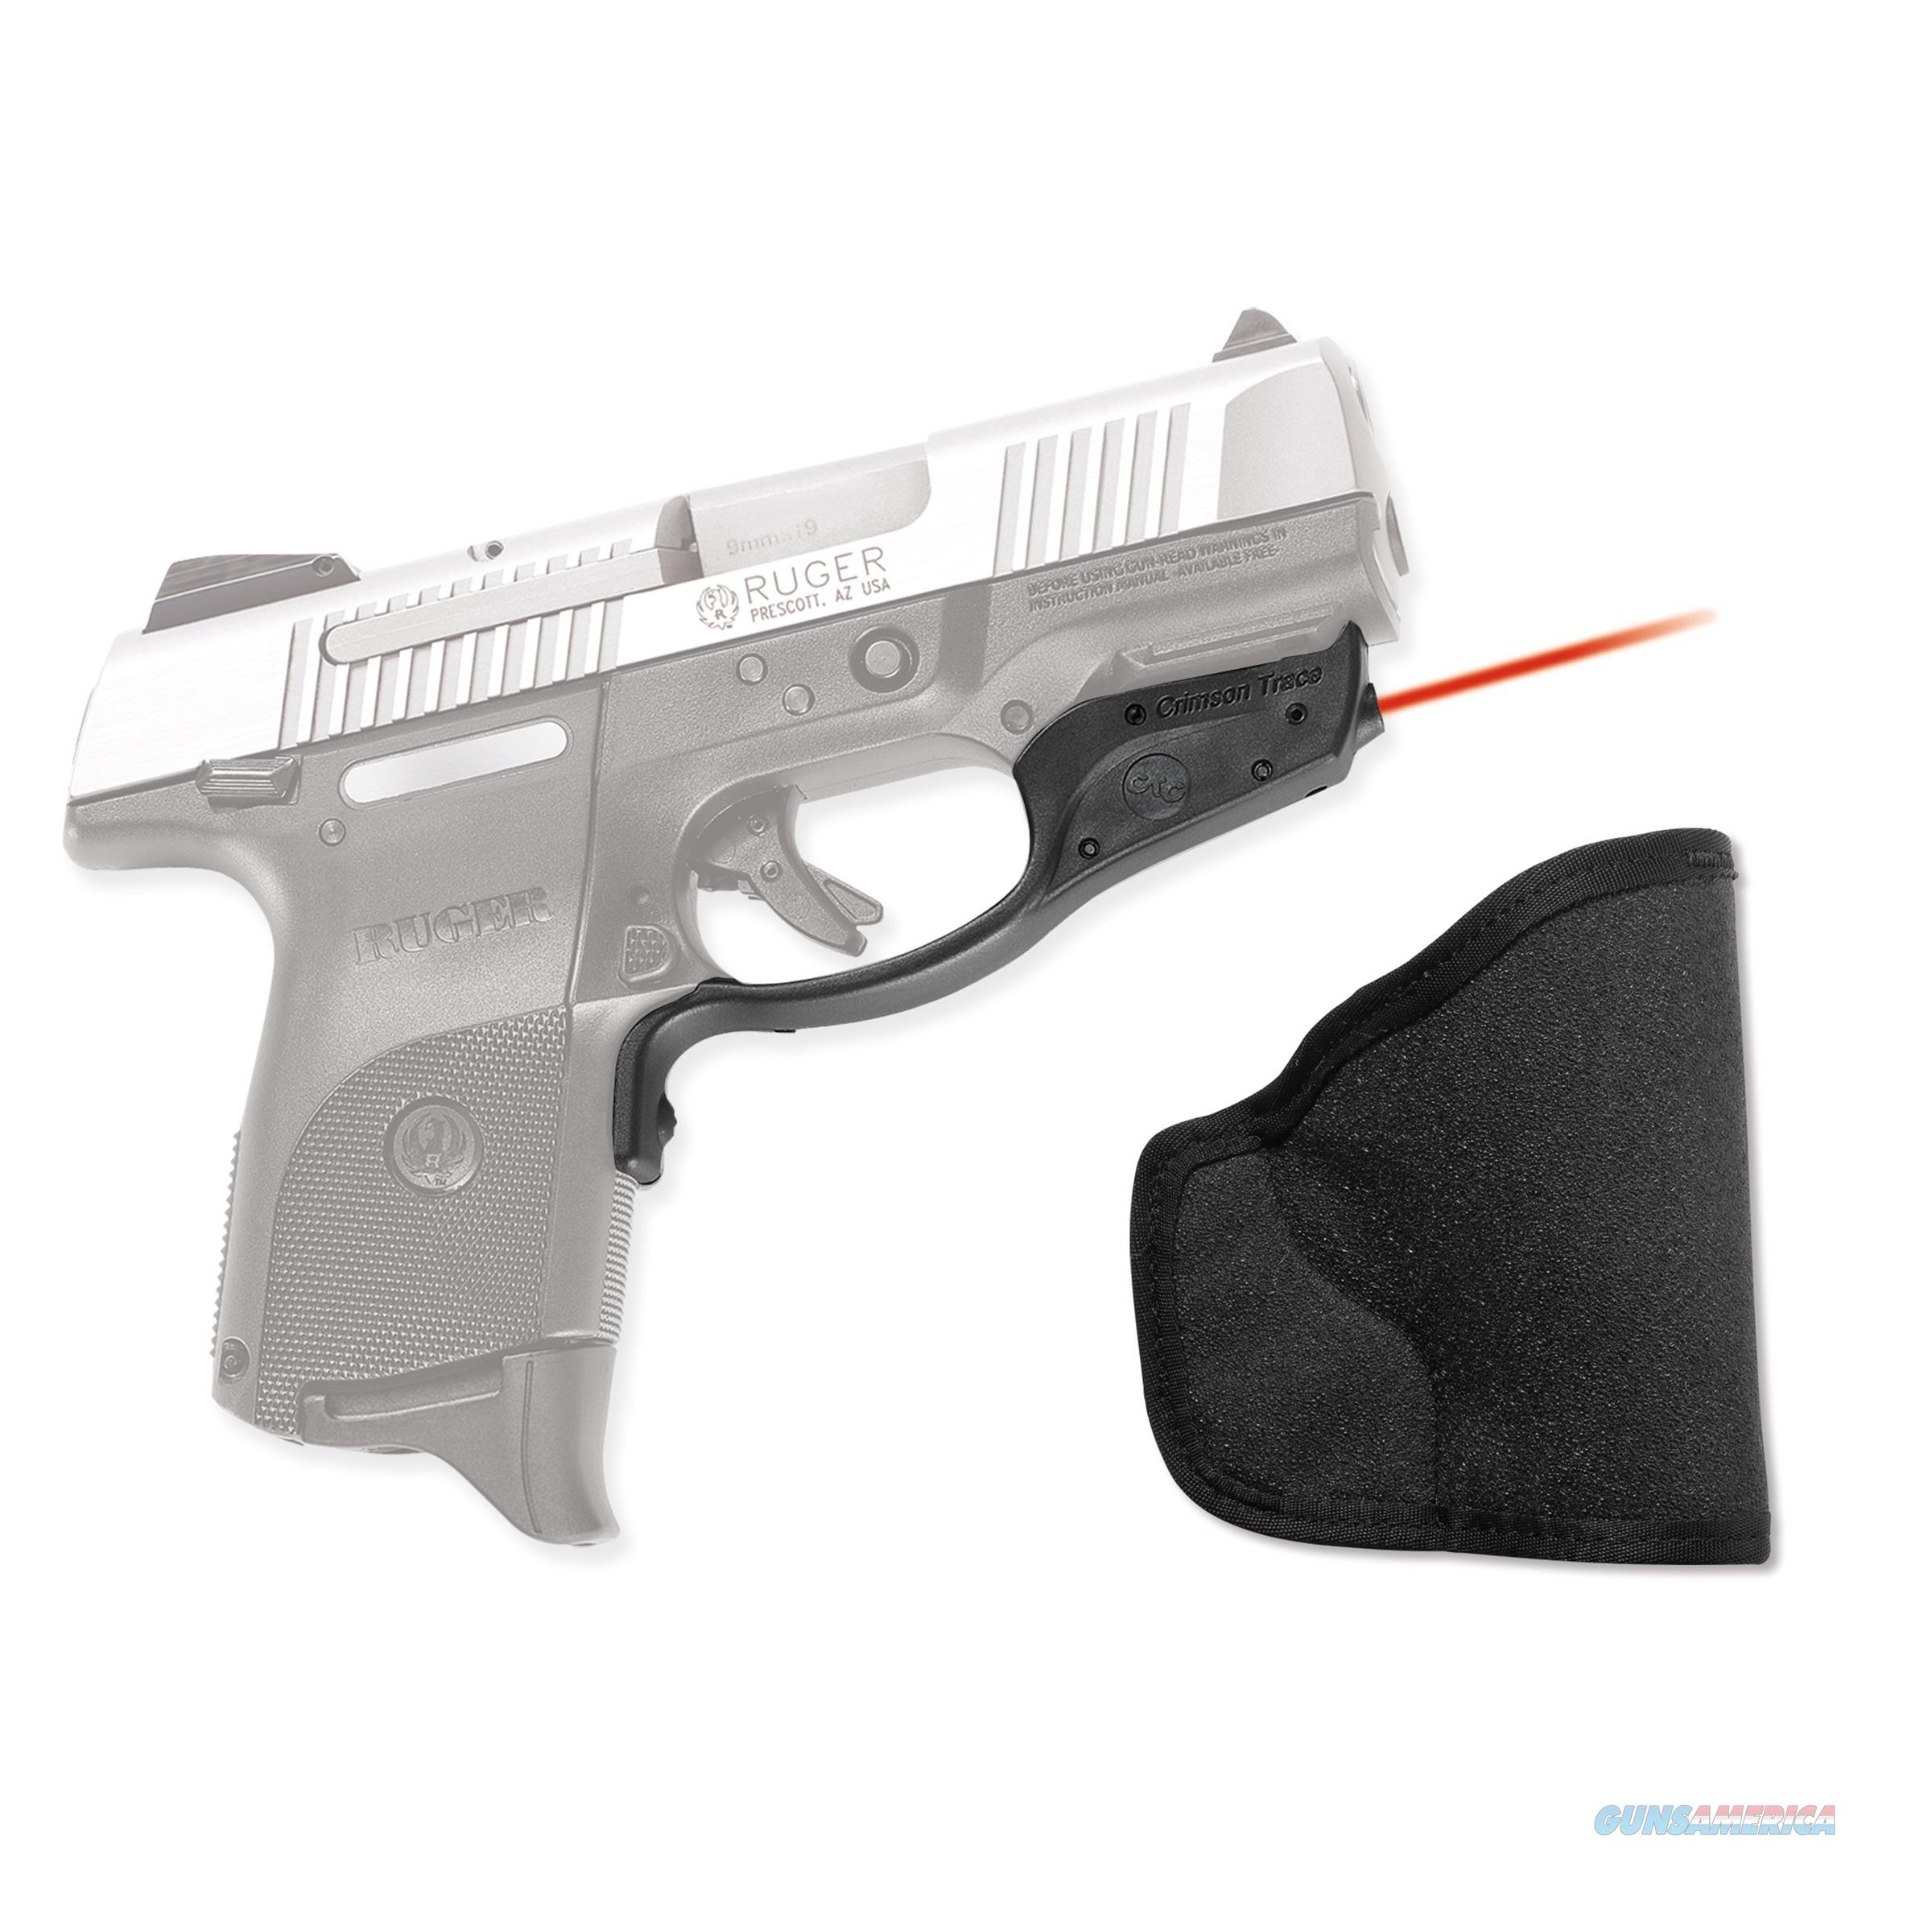 Crimson Trace Ruger LG-449-H-S  Non-Guns > Gun Parts > Misc > Rifles